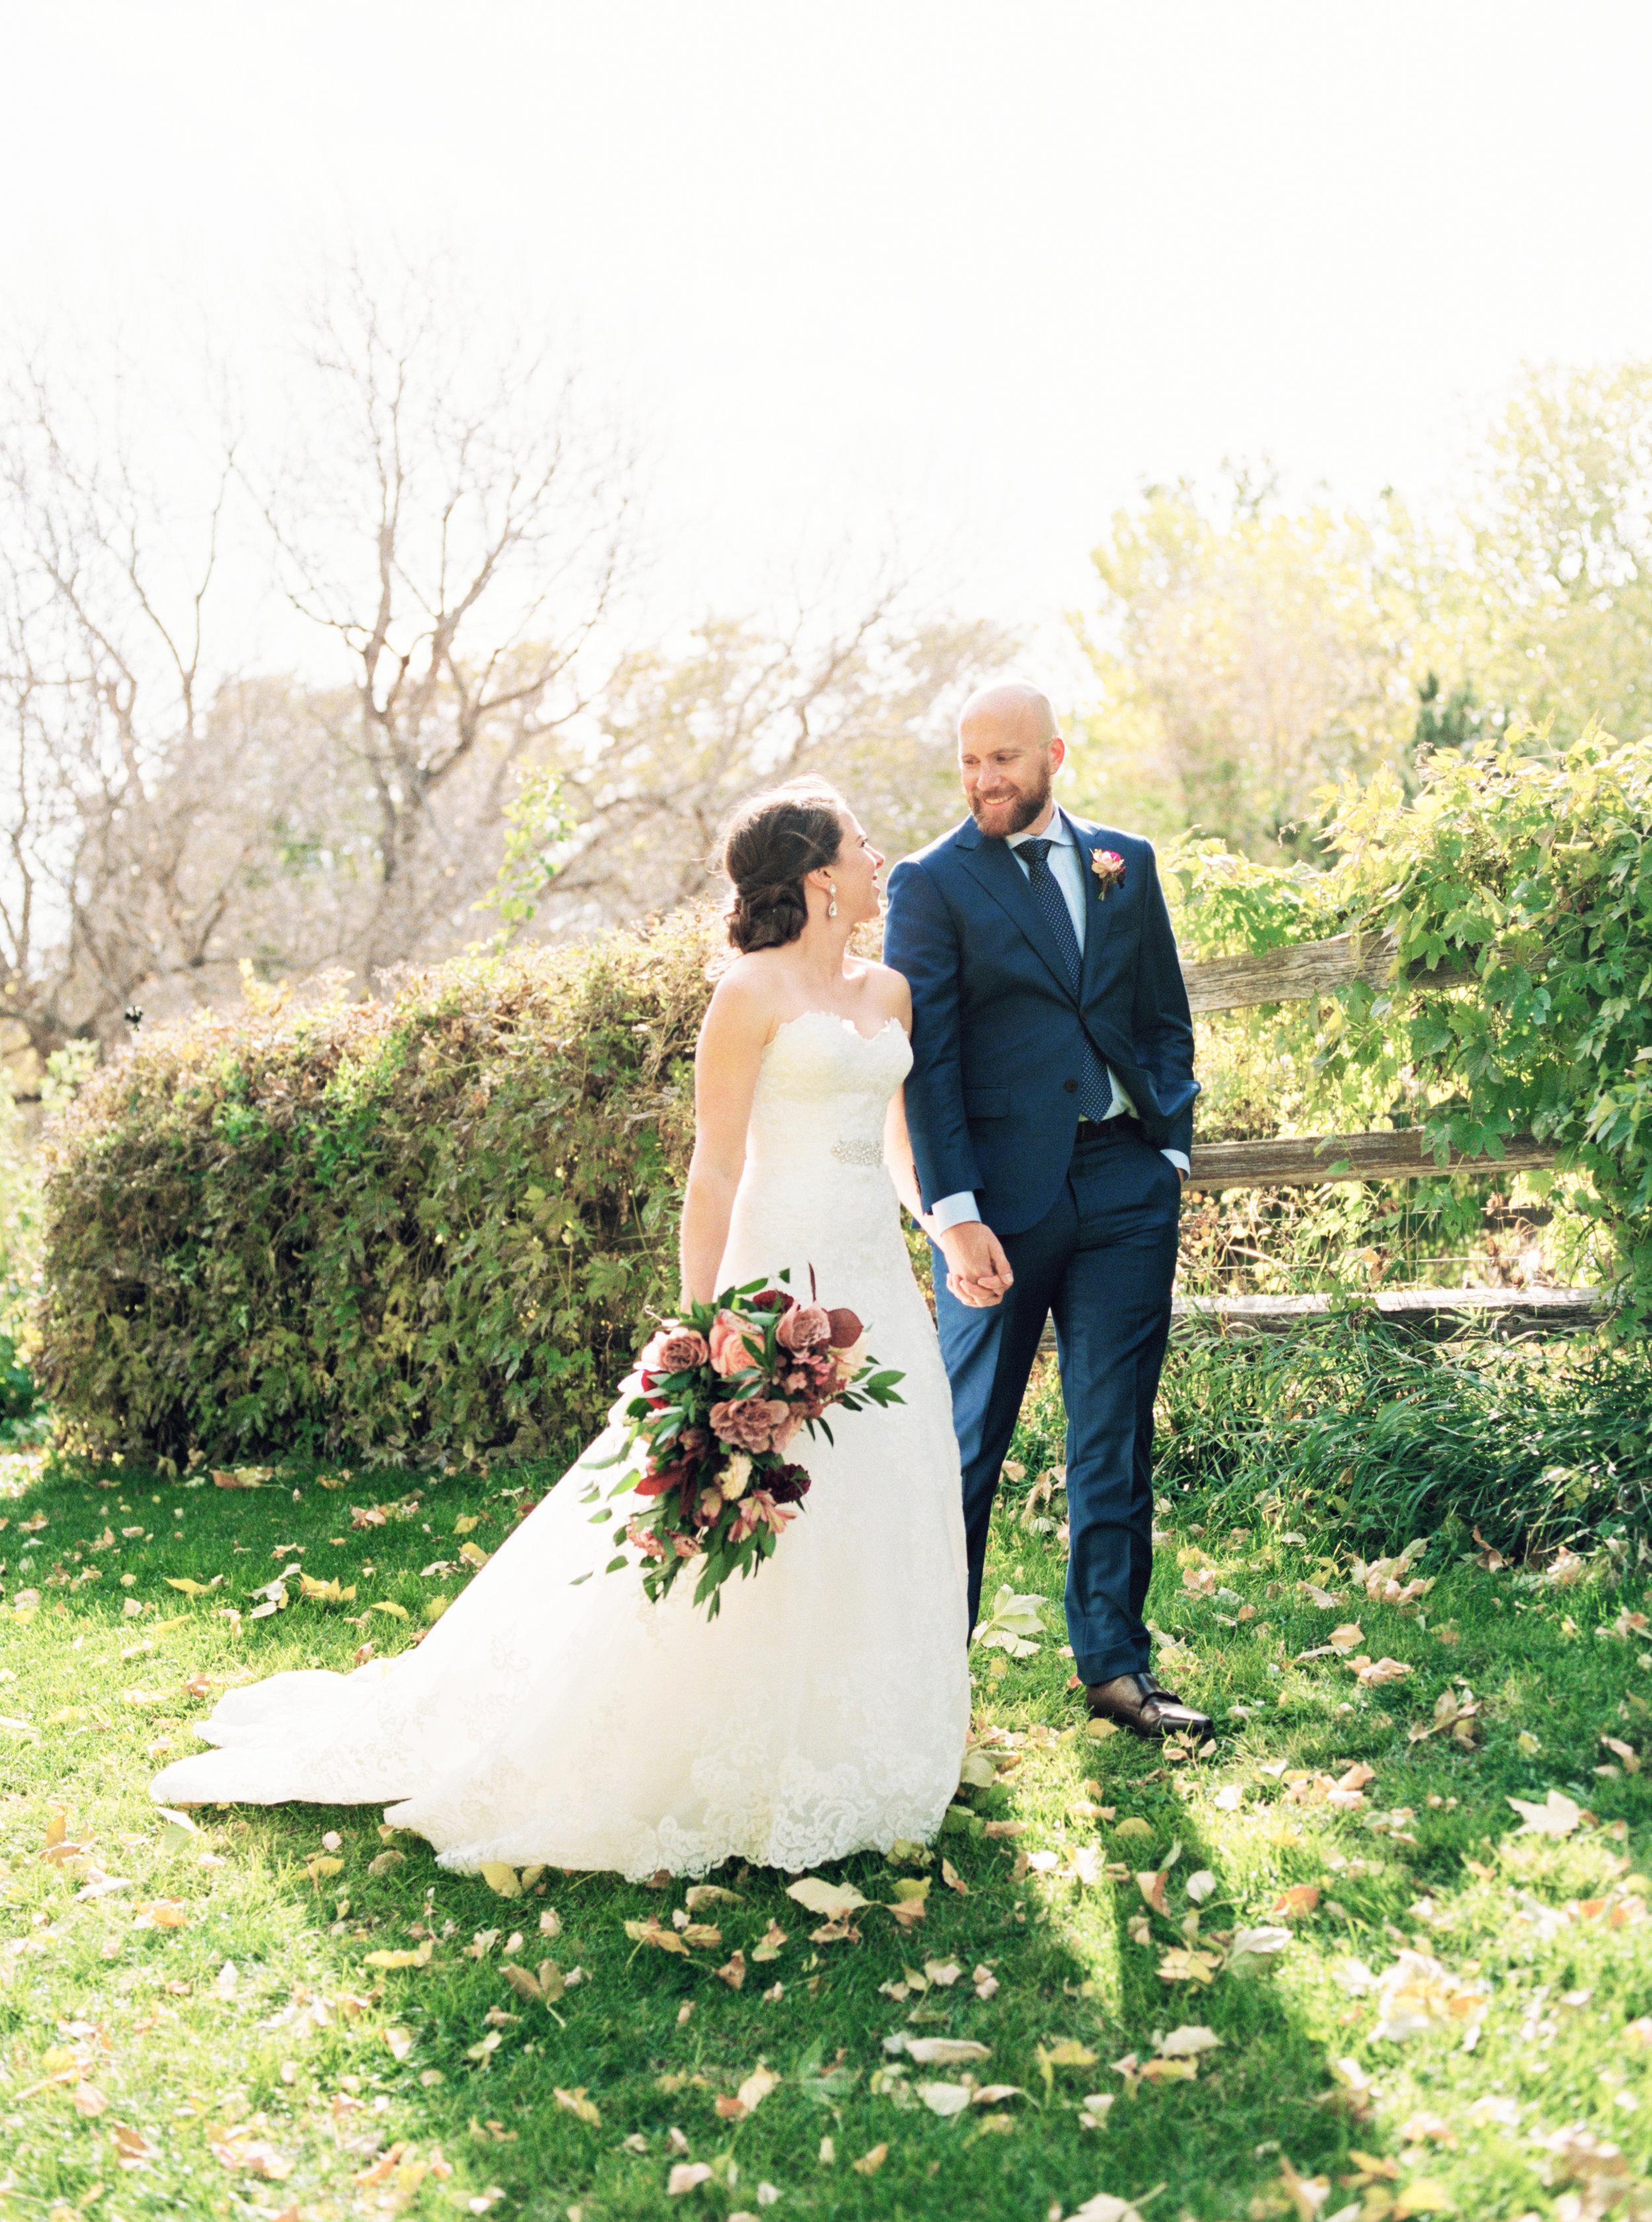 Lyons Farmette Wedding with Purple Summer Events - Luxury Fine Art Wedding Photographer